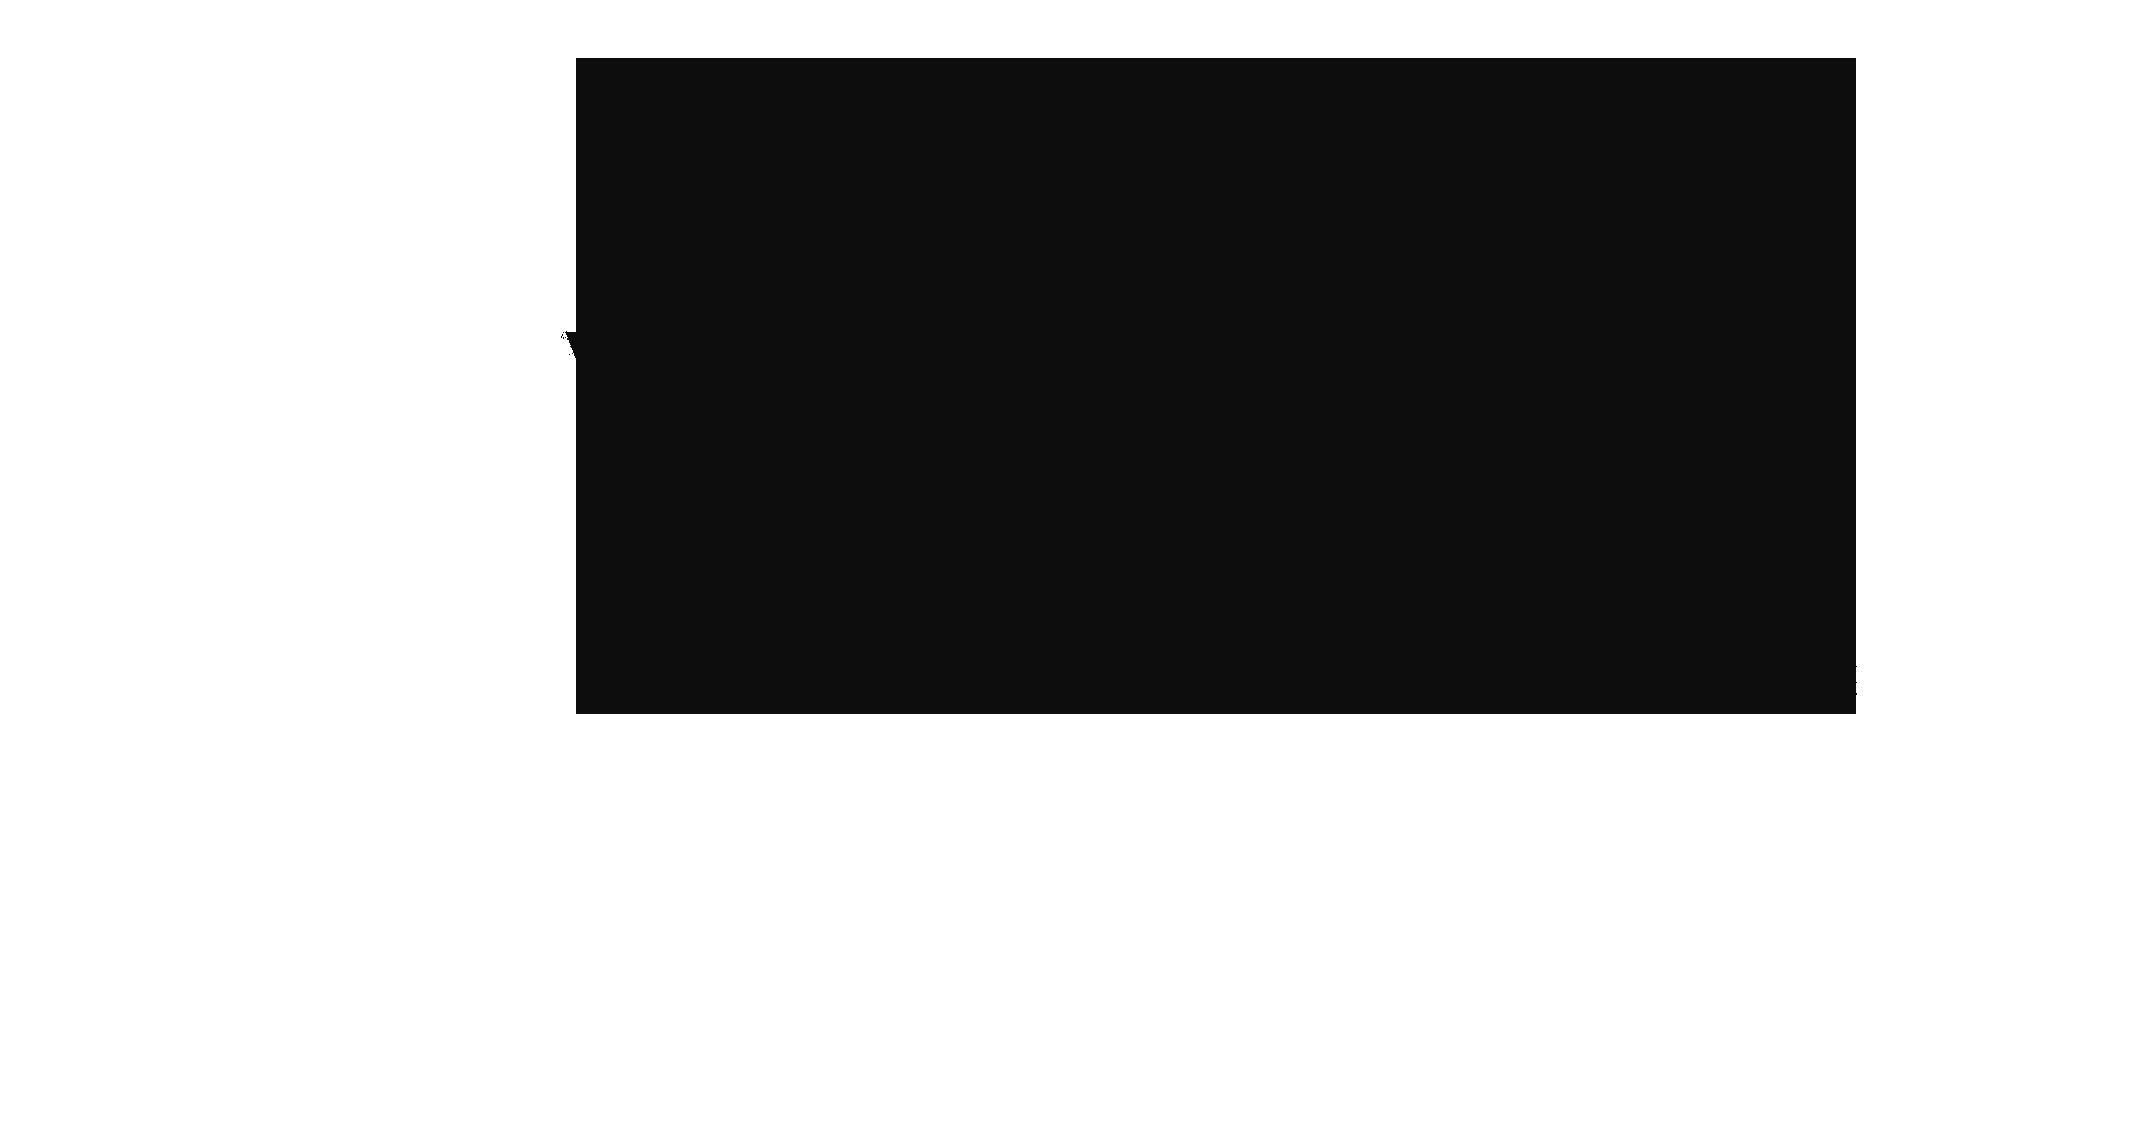 Insurance innovision eye care. Vision clipart logo